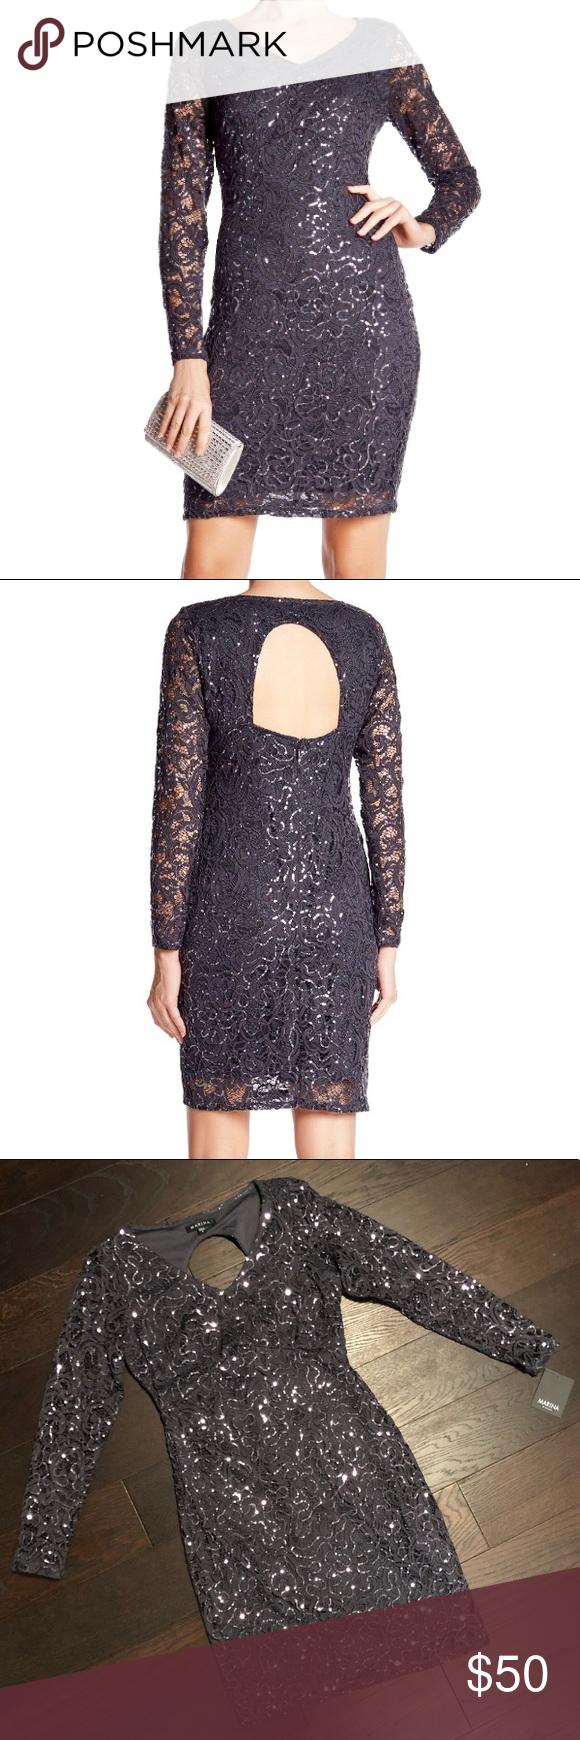 Marina sequin lace long sleeve back cutout dress nwt marina dress